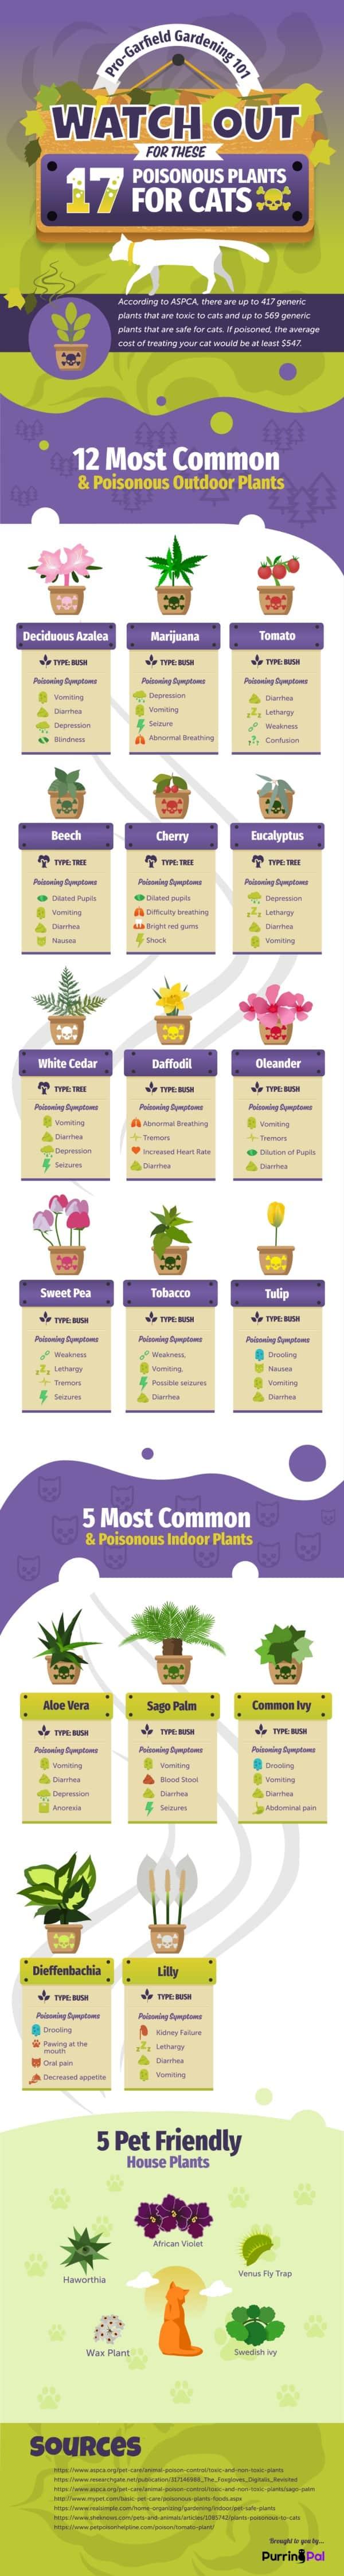 Toxic pet plants infographic #pets #ilovemypets #petpoison #keeppetssafe #bgl